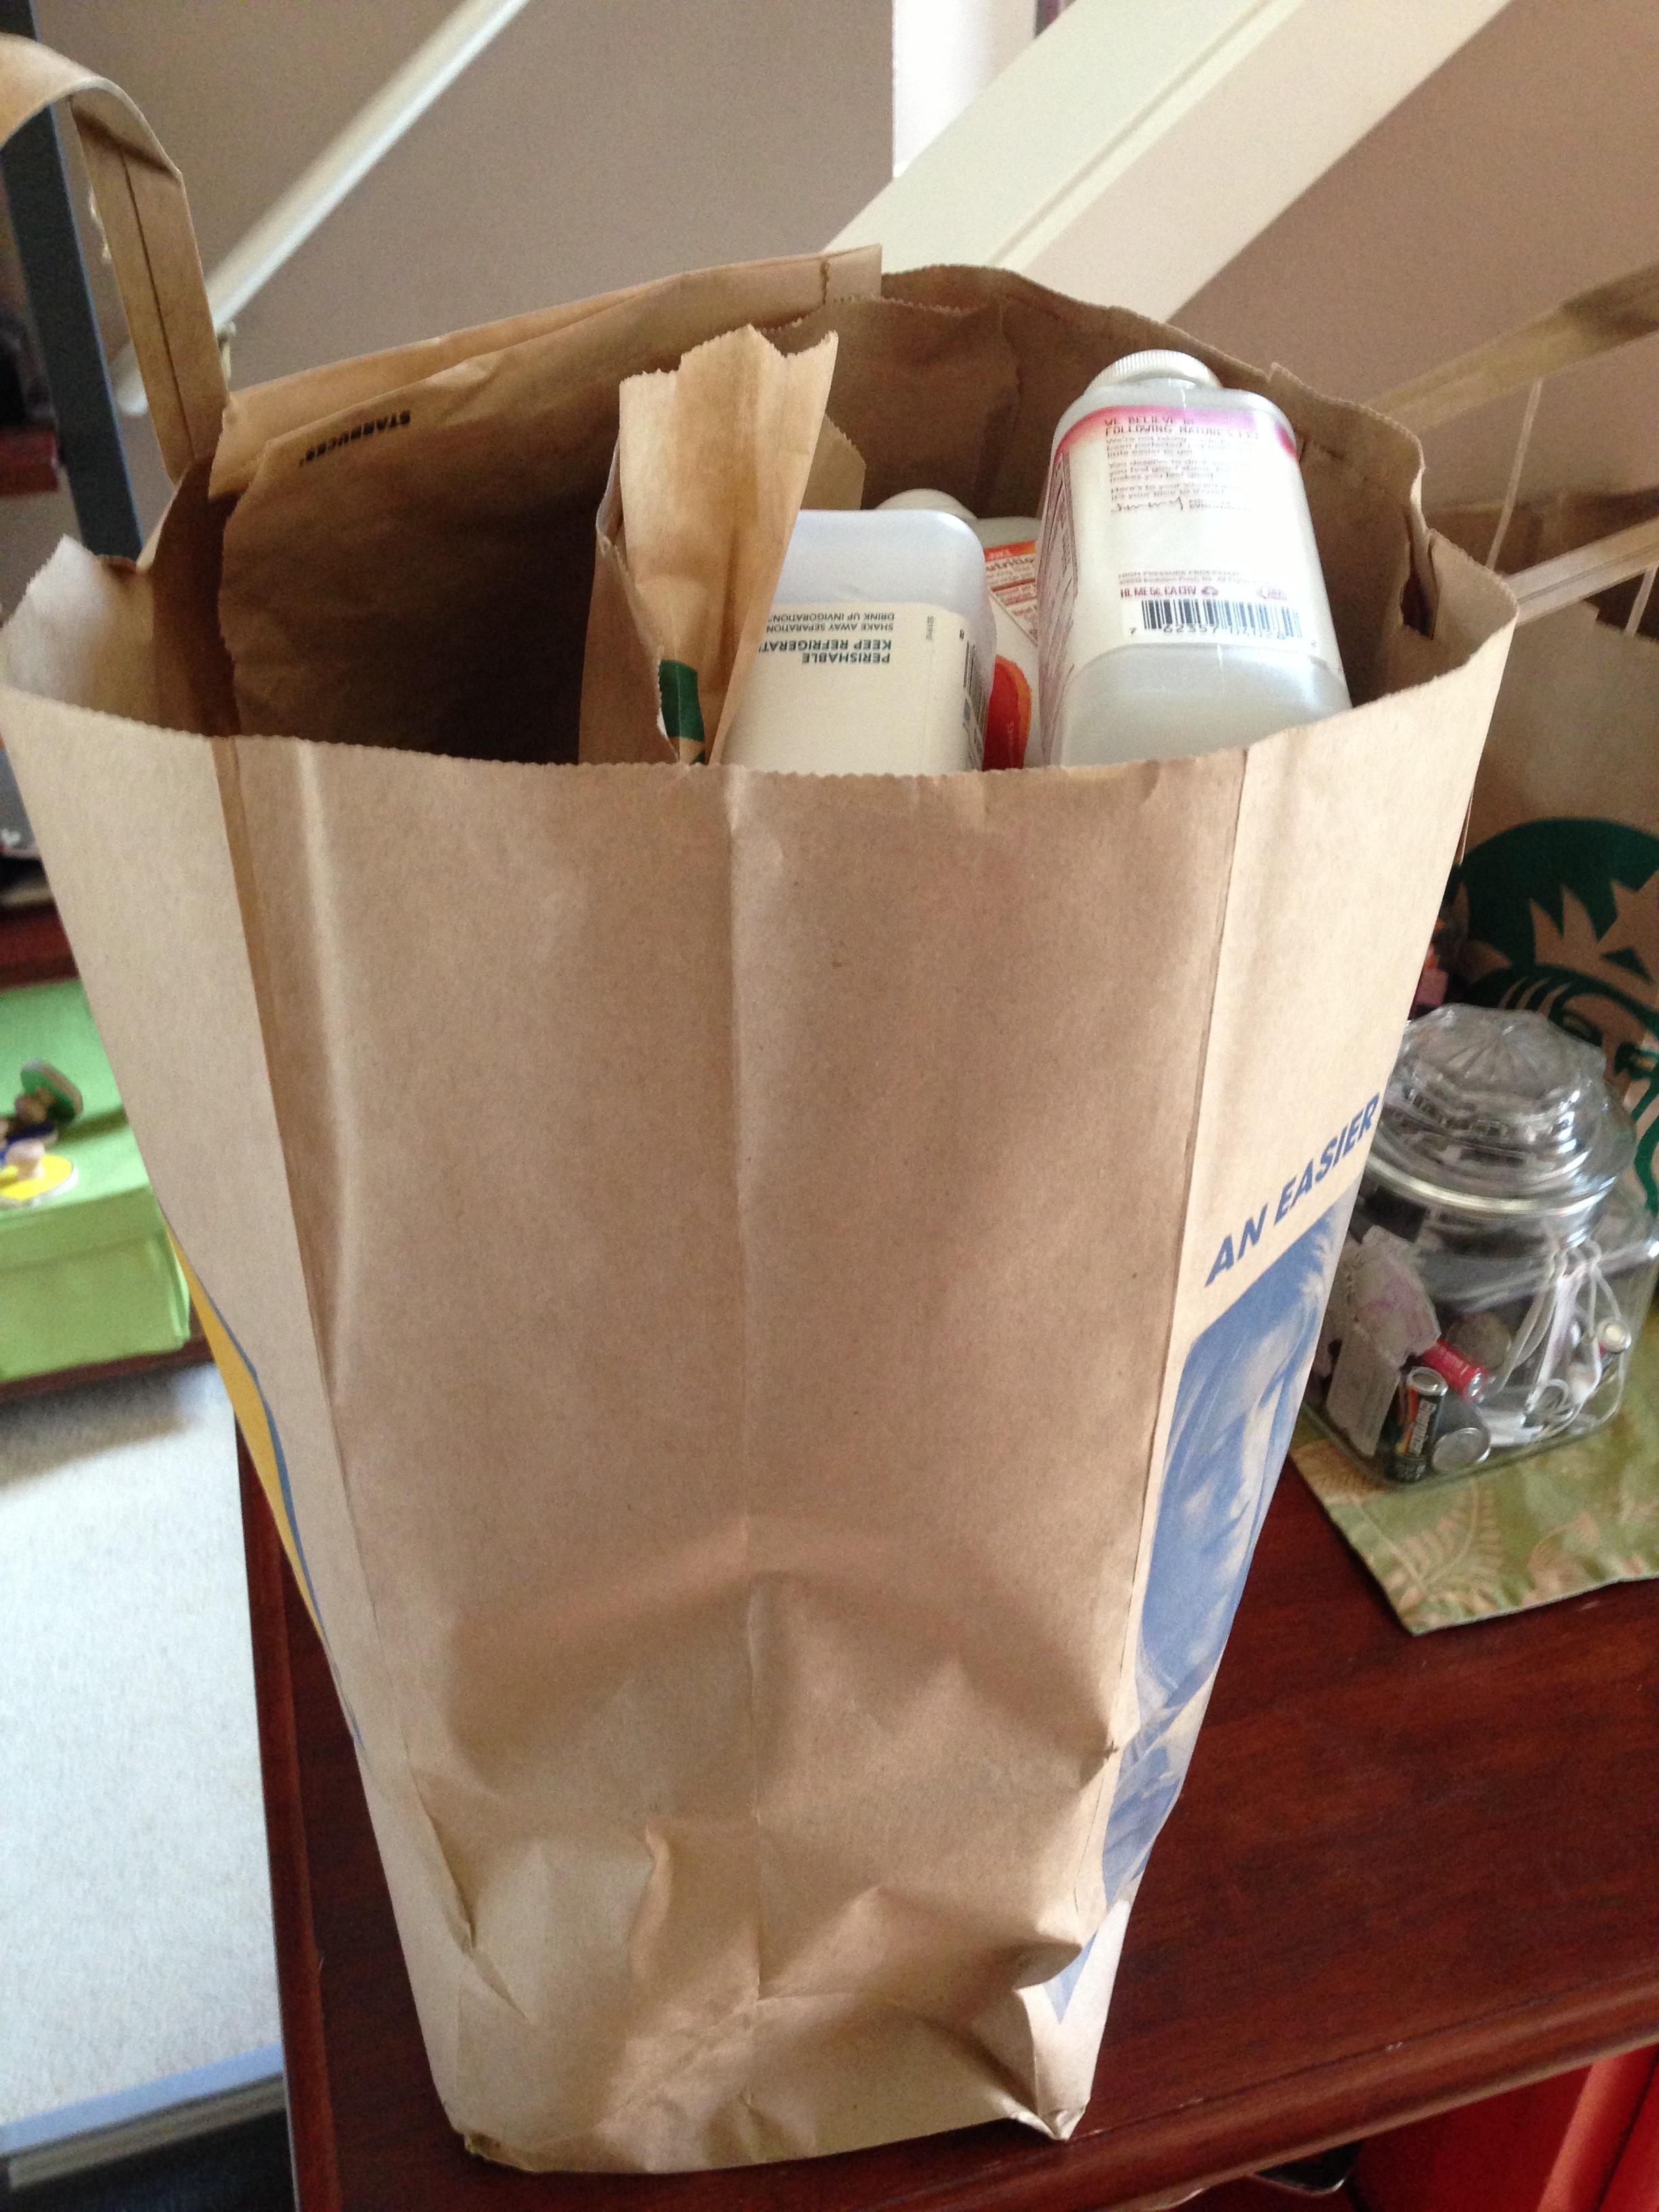 1st grocery bag full of packaging